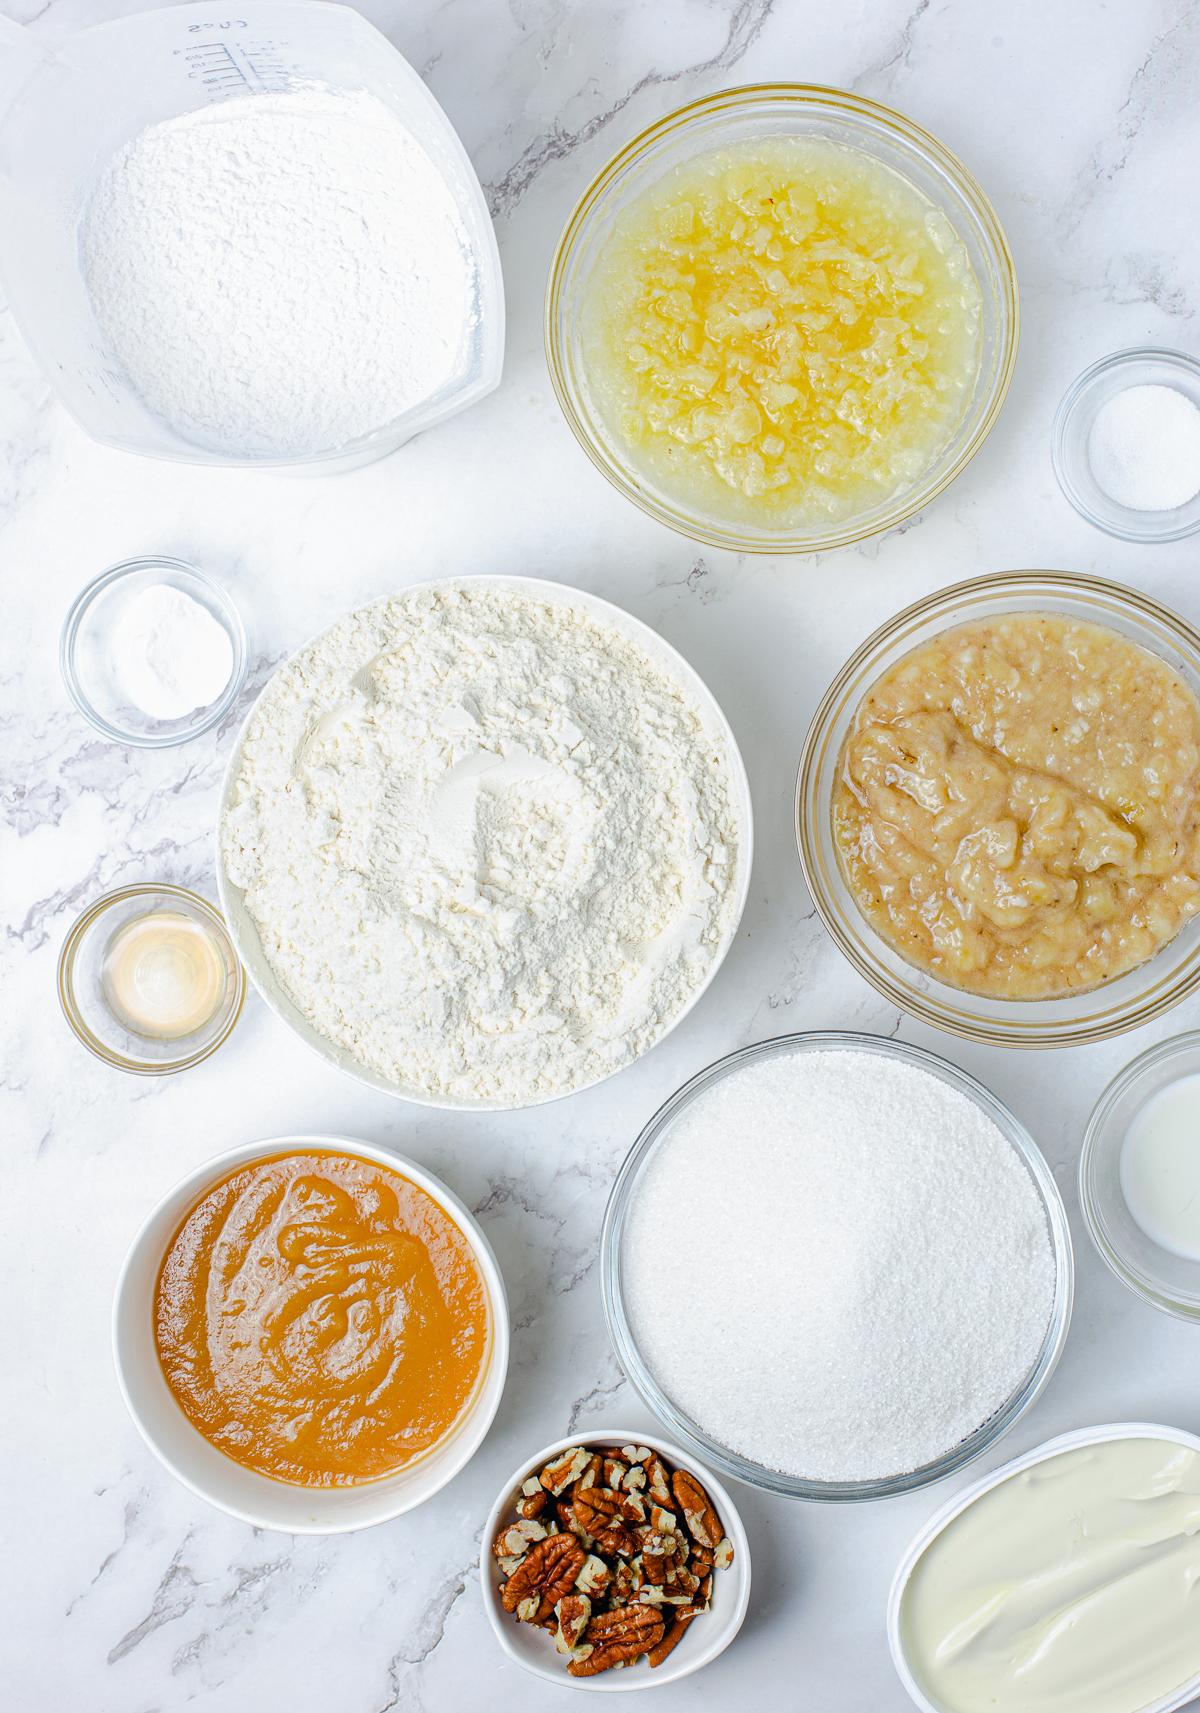 Ingredients needed to make a Hummingbird Bundt Cake